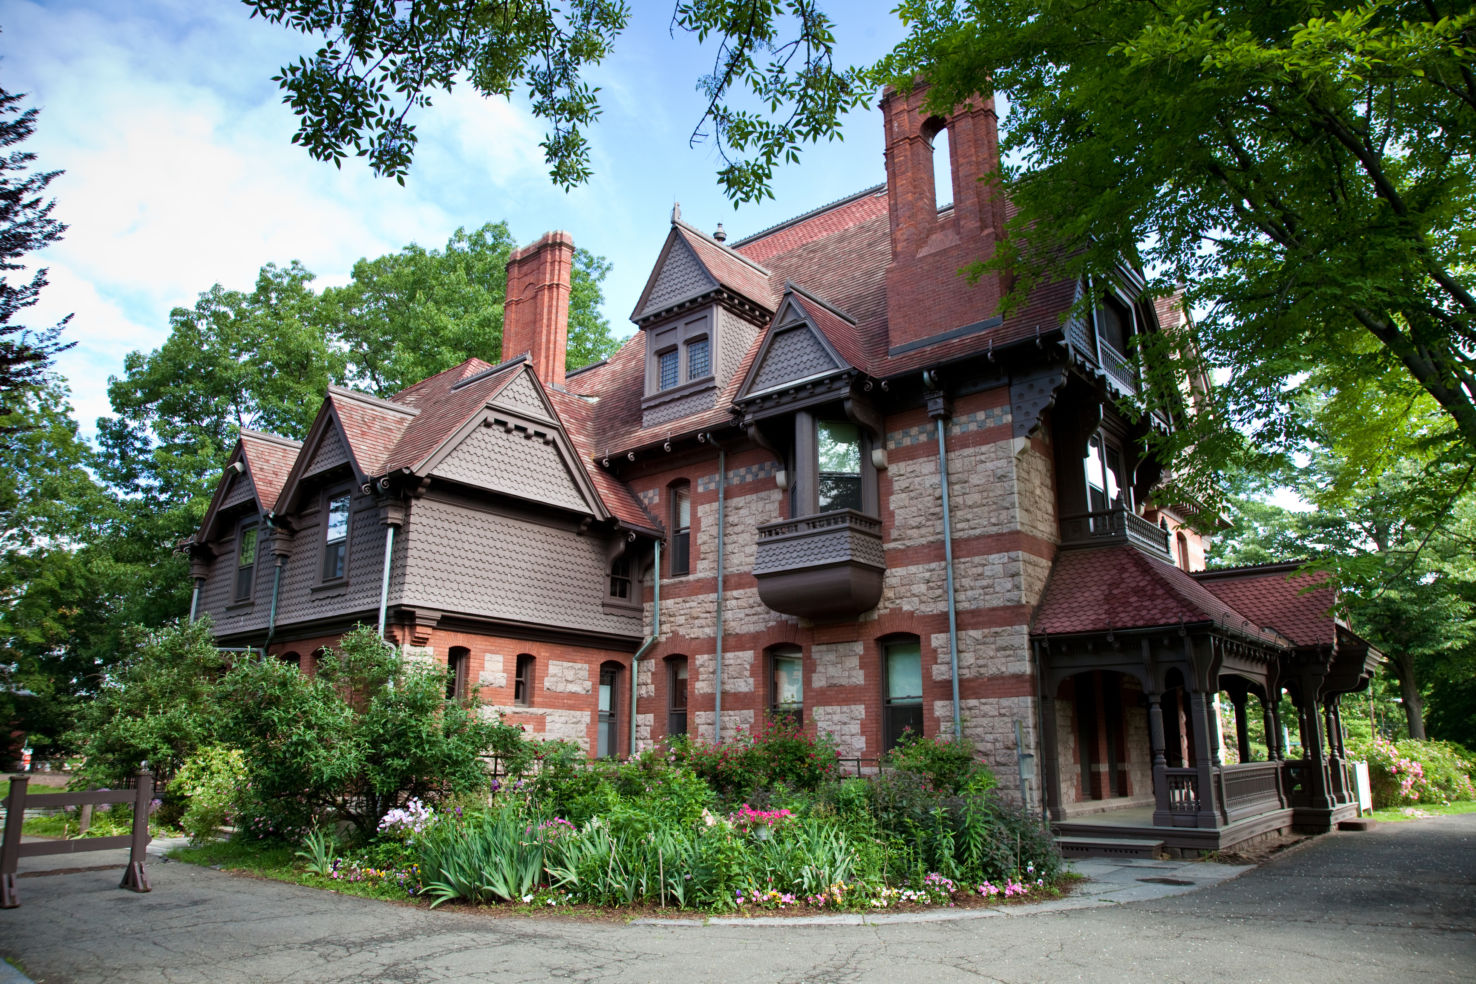 Mark Twain, Harriet Beecher Stowe, Katharine Seymour Day, Hartford, Connecticut